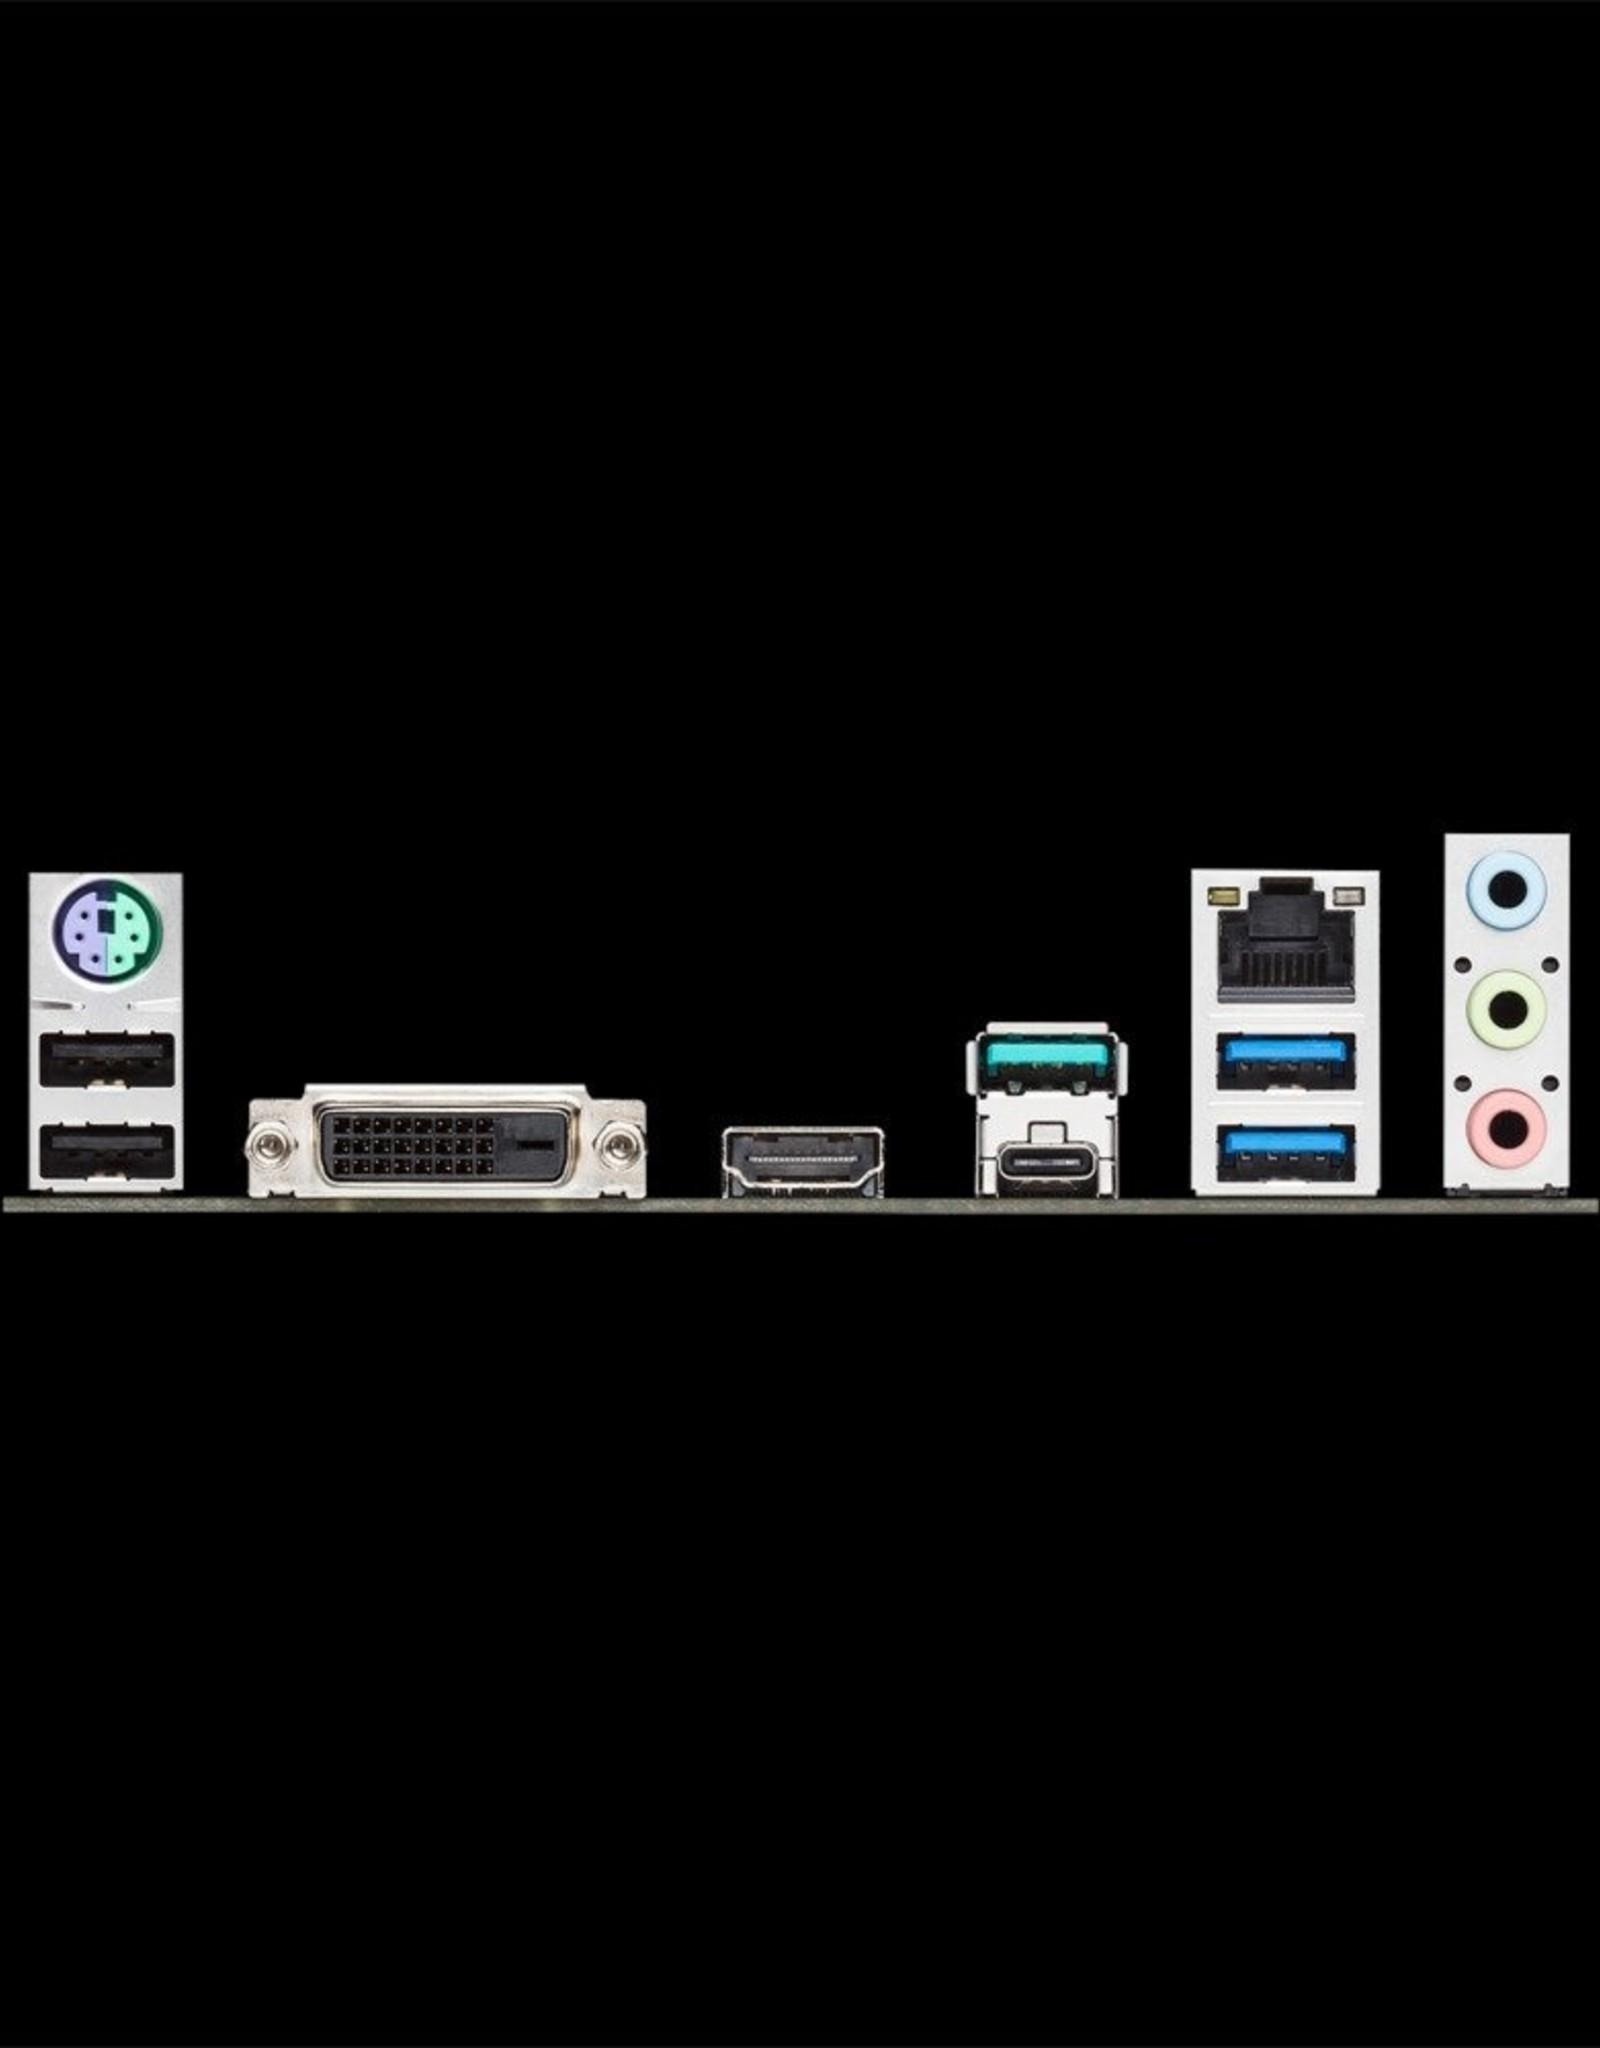 MB  TUF B450M-Plus Gaming / AM4 / B450 / m.2 / mATX